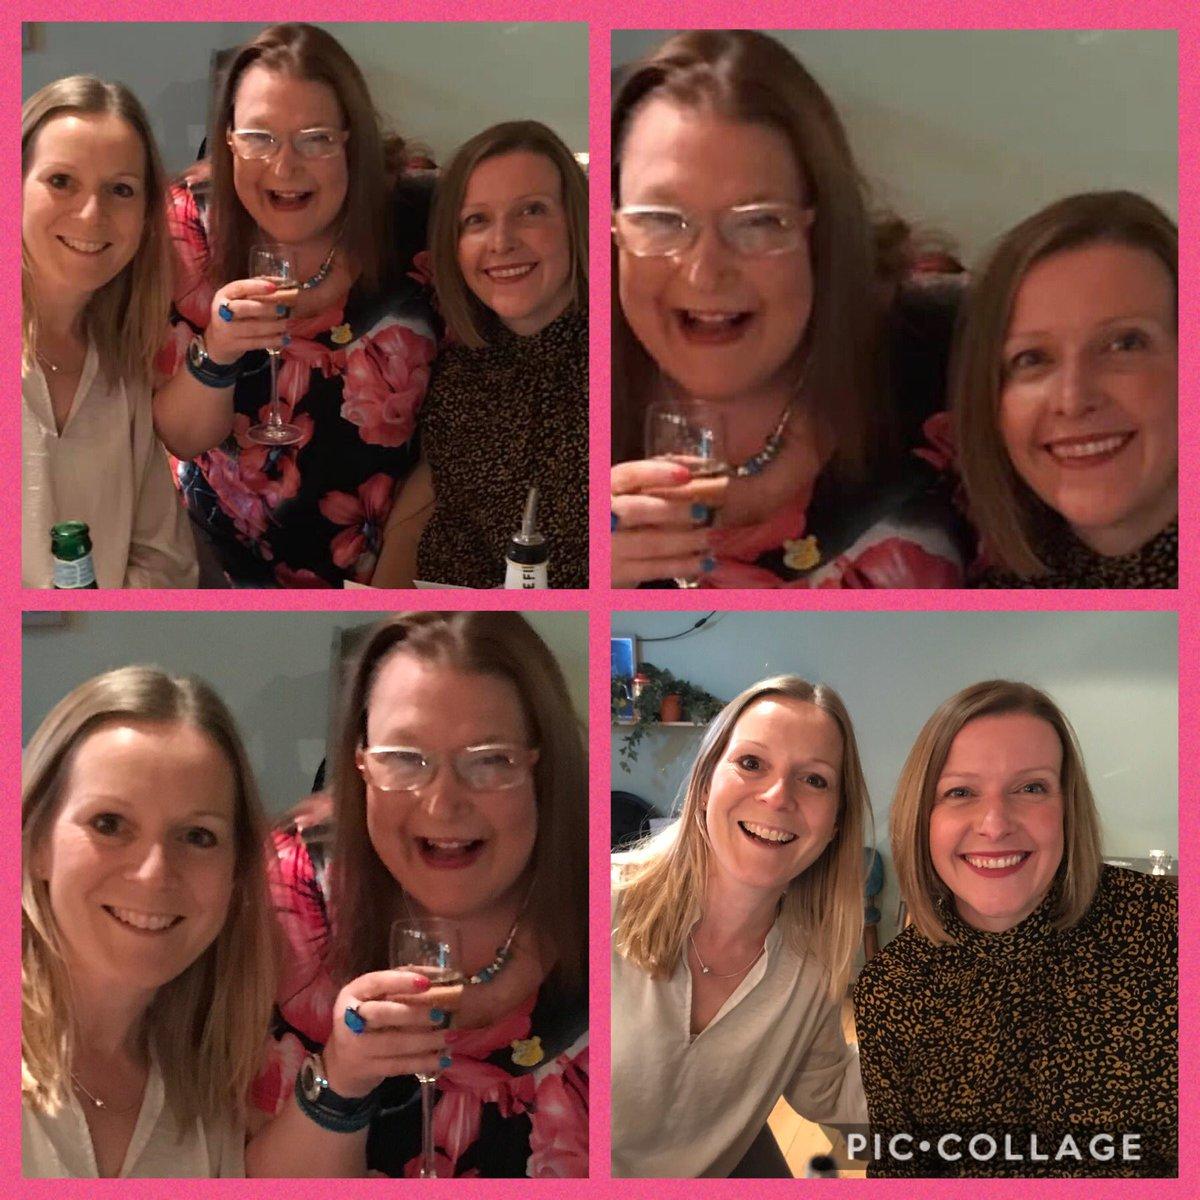 @Aacdiscokaraoke MrsWilks Hi all:Lovely evening with besties. X#feelgoodfriday #selfiqueen #prosecco #chinchin #friends #makingmemories #happymrswilkspic.twitter.com/utXi0t3KH8